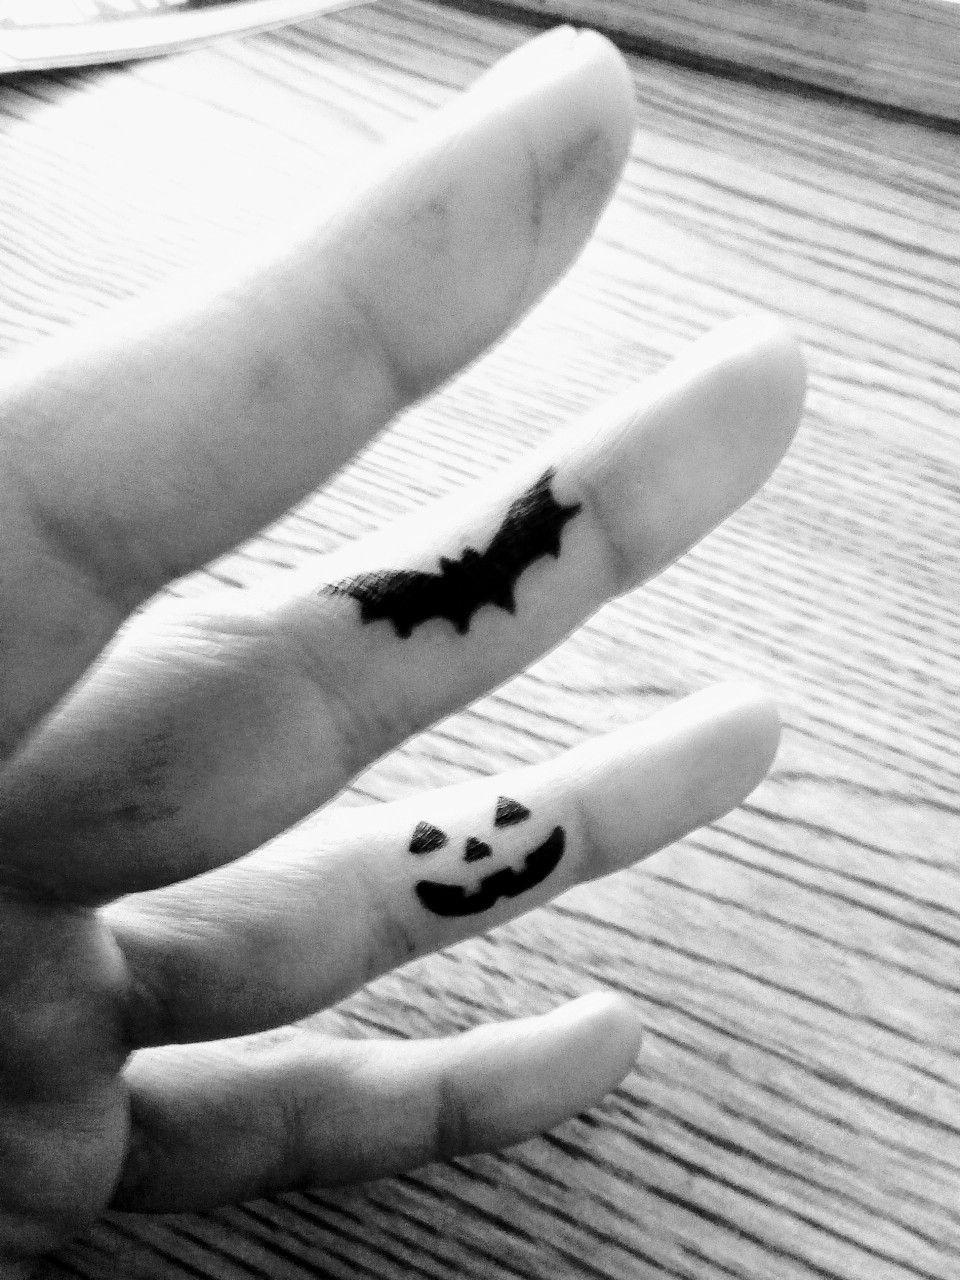 New piercing ideas  Pin by Brandi Chitwood on Flesh canvaS  Pinterest  Tattoo